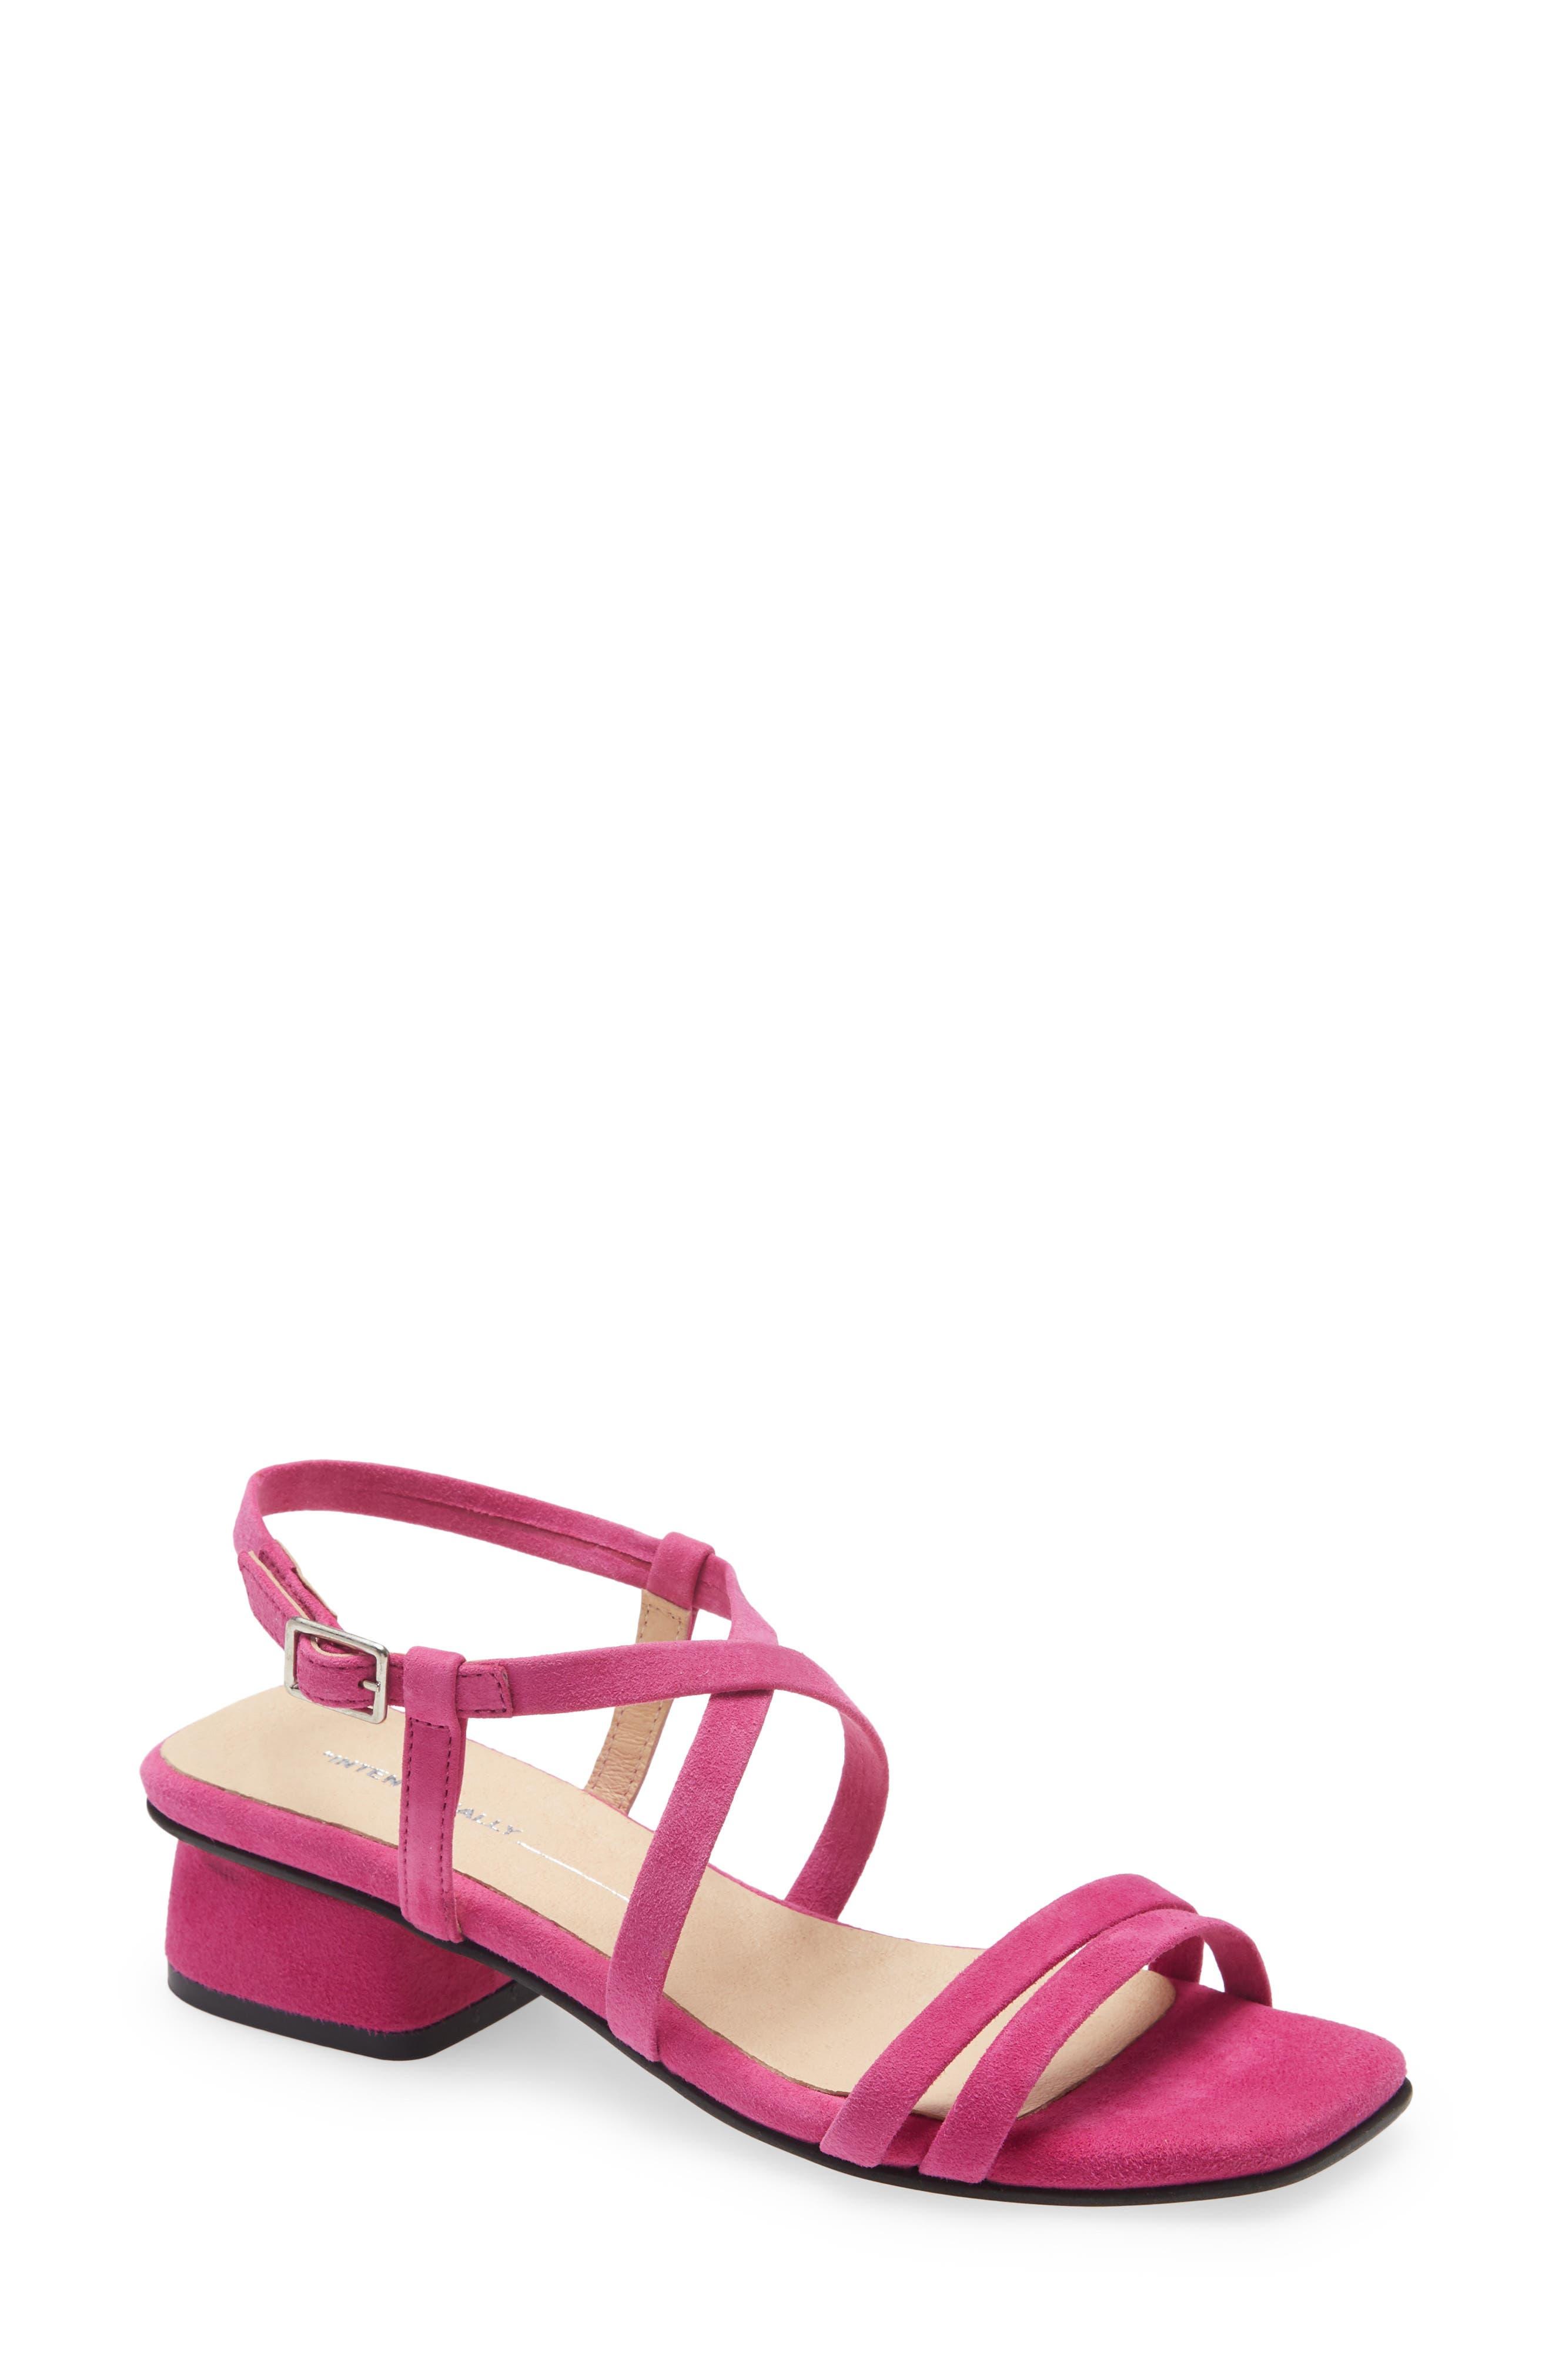 Hilltop Strappy Sandal